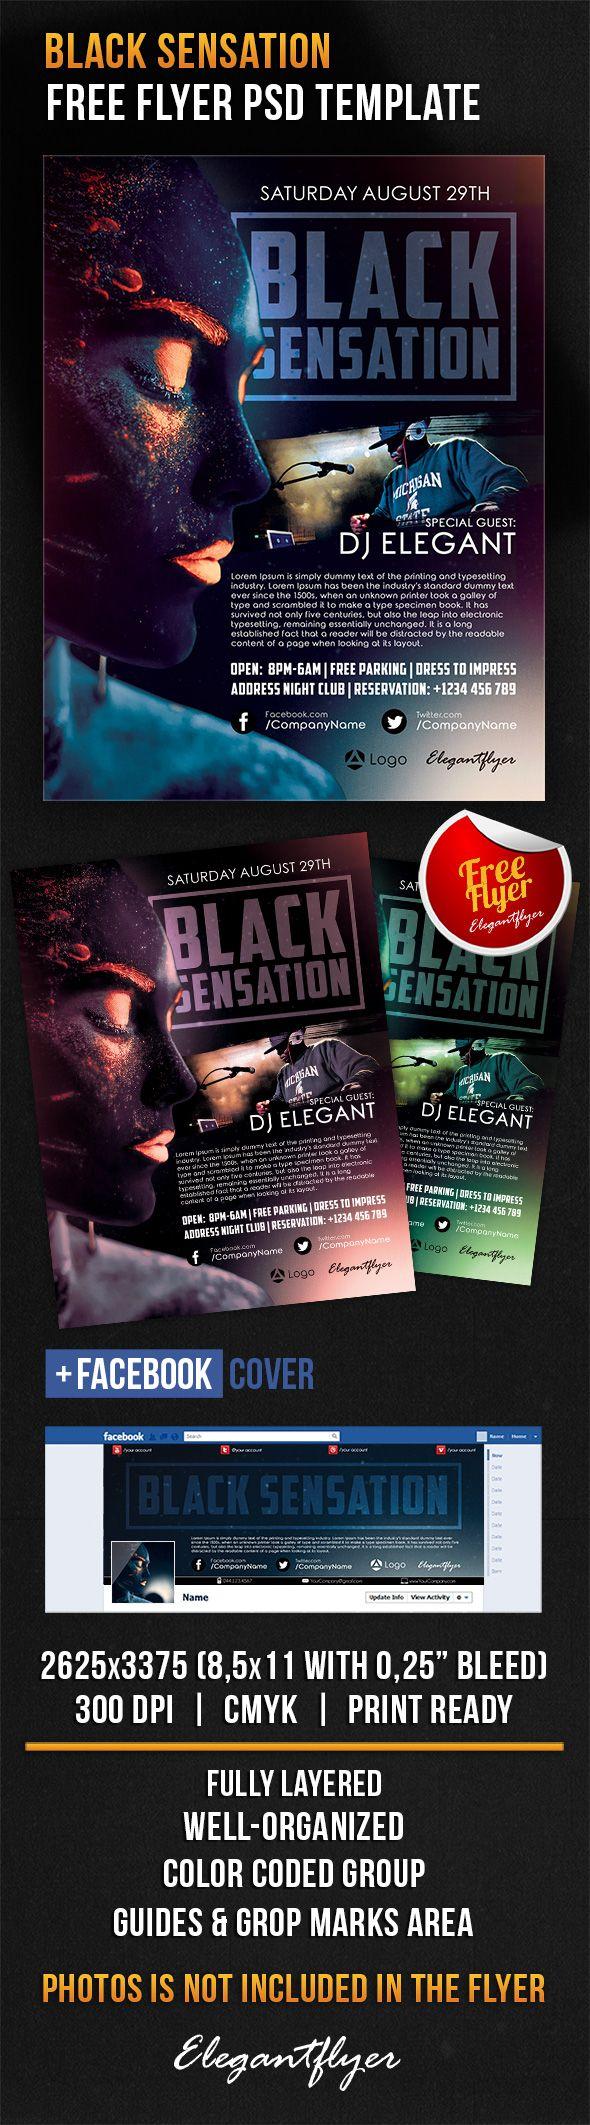 Black Sensation – Free Flyer PSD Template + Facebook Cover https://www.elegantflyer.com/free-flyers/free-club-flyer-templates/black-sensation-free-flyer-psd-template-facebook-cover/